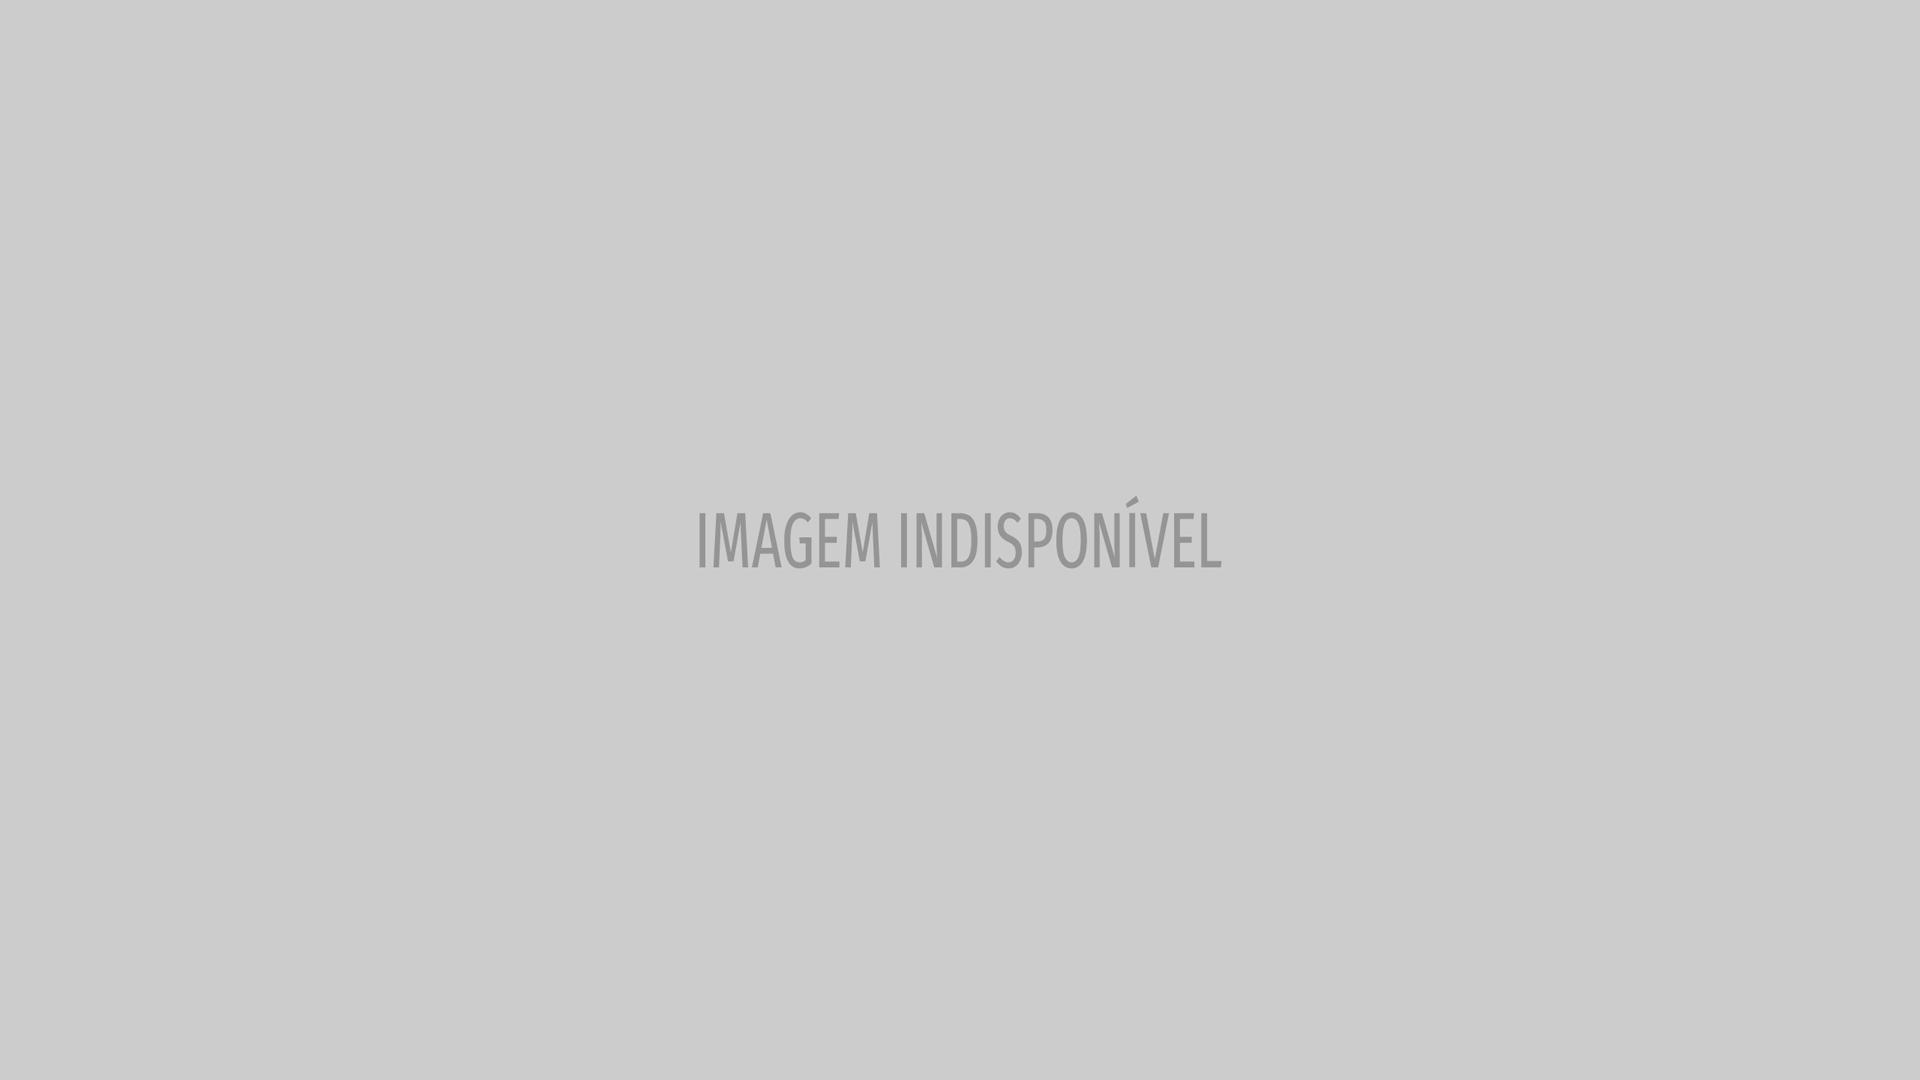 Beyoncé exibe decote 'fervoroso' em saída romântica com Jay-Z